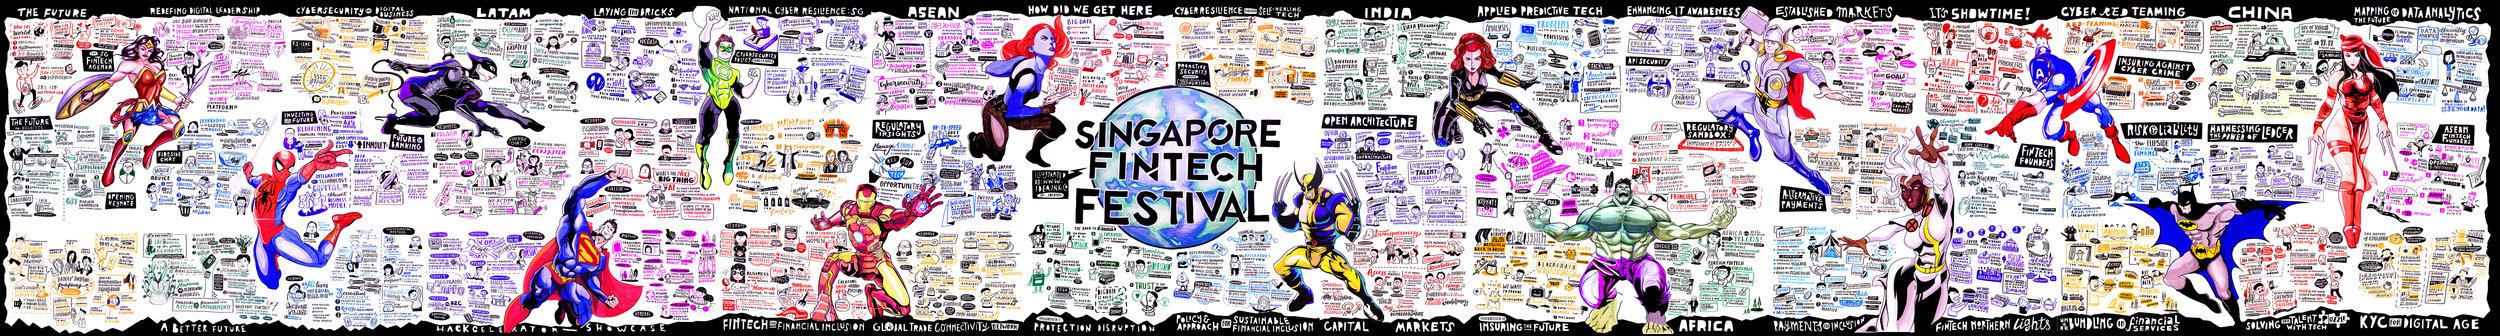 Singapore Fintech Festival 2017 Sketchwall 2.jpg